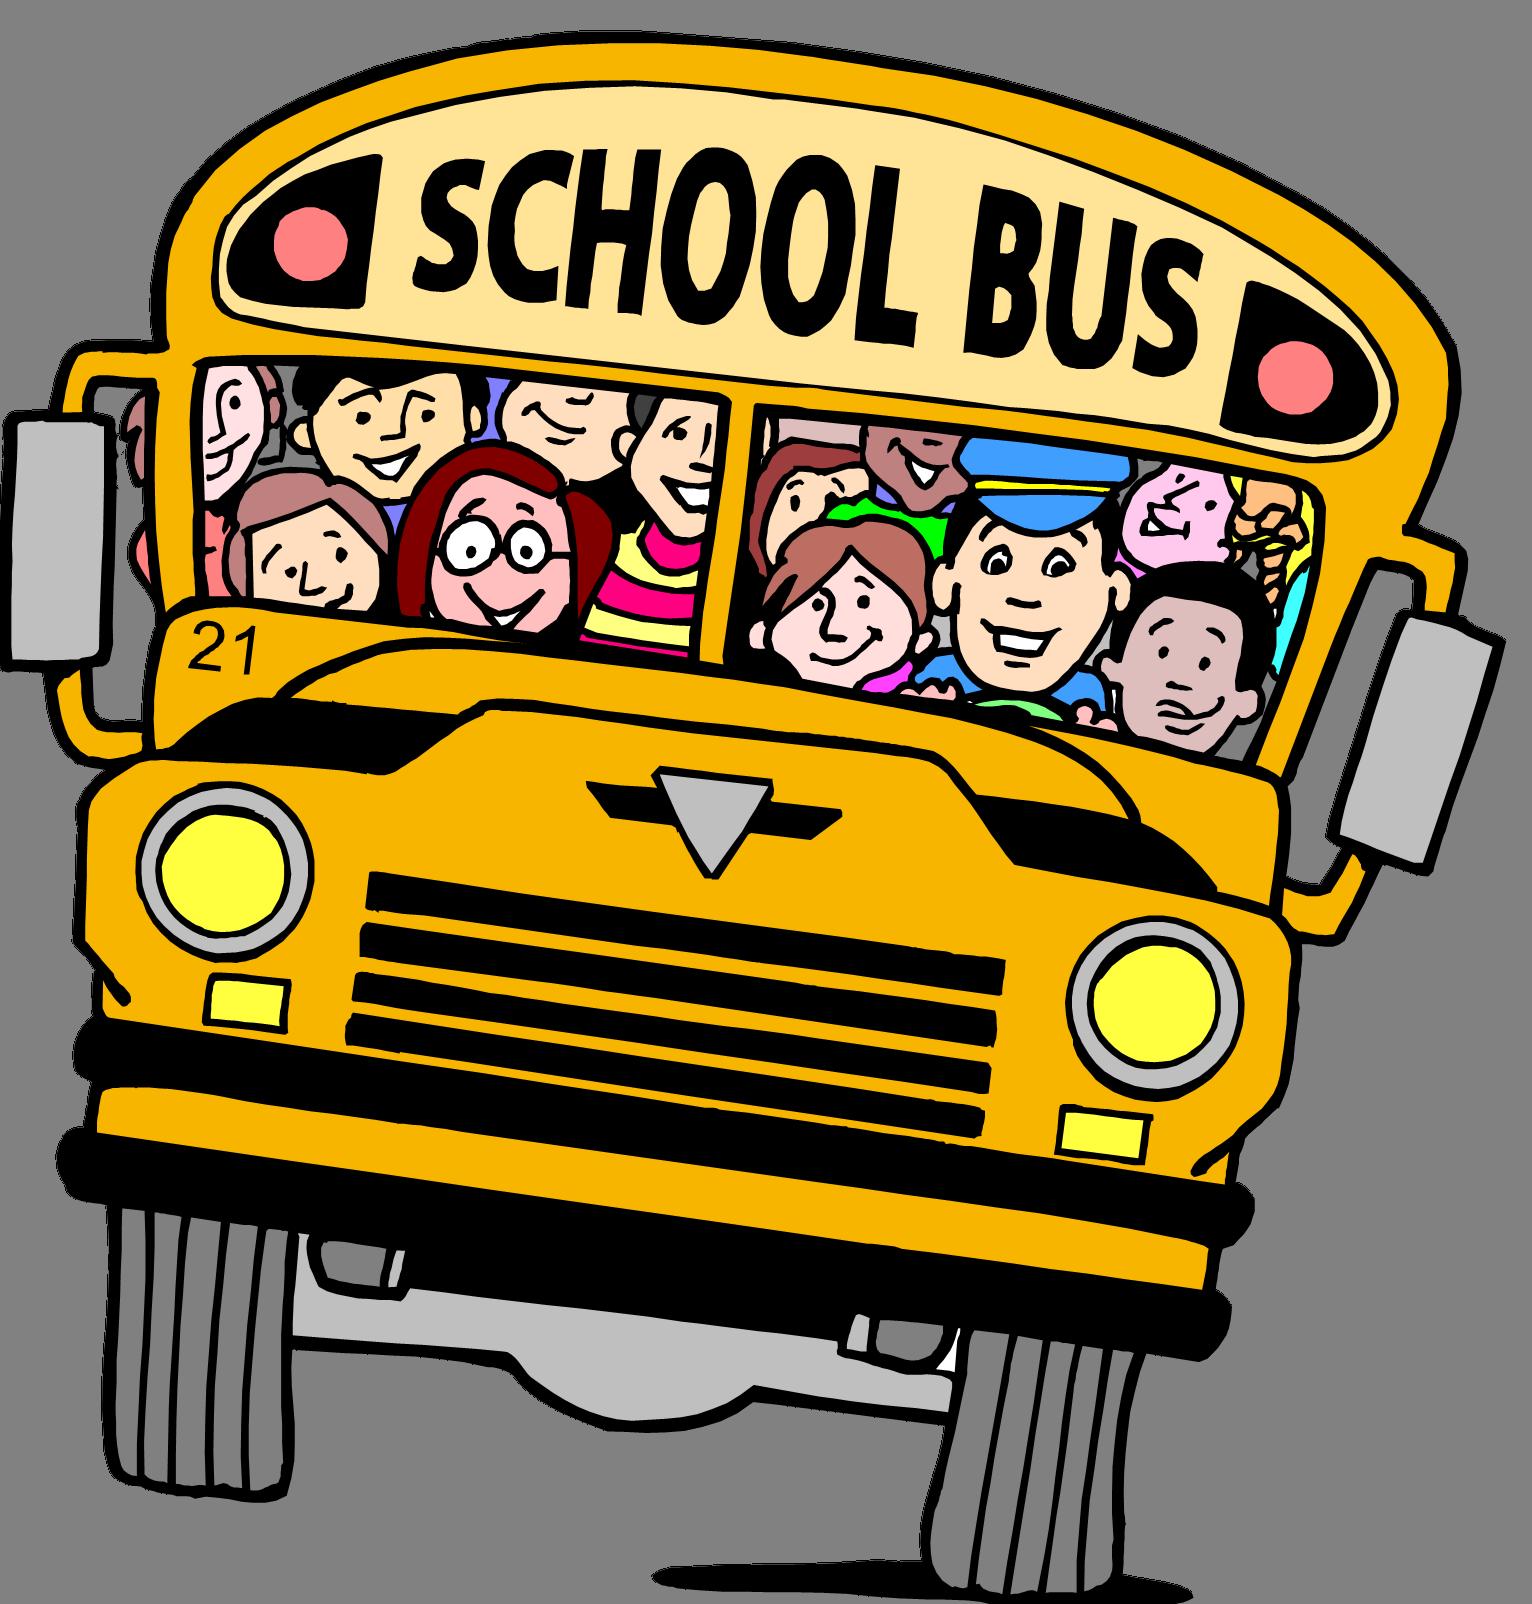 schoolbus clipart clip art school bus terrace pinterest rh pinterest ca clip art school bus stop sign clip art school bus stop sign